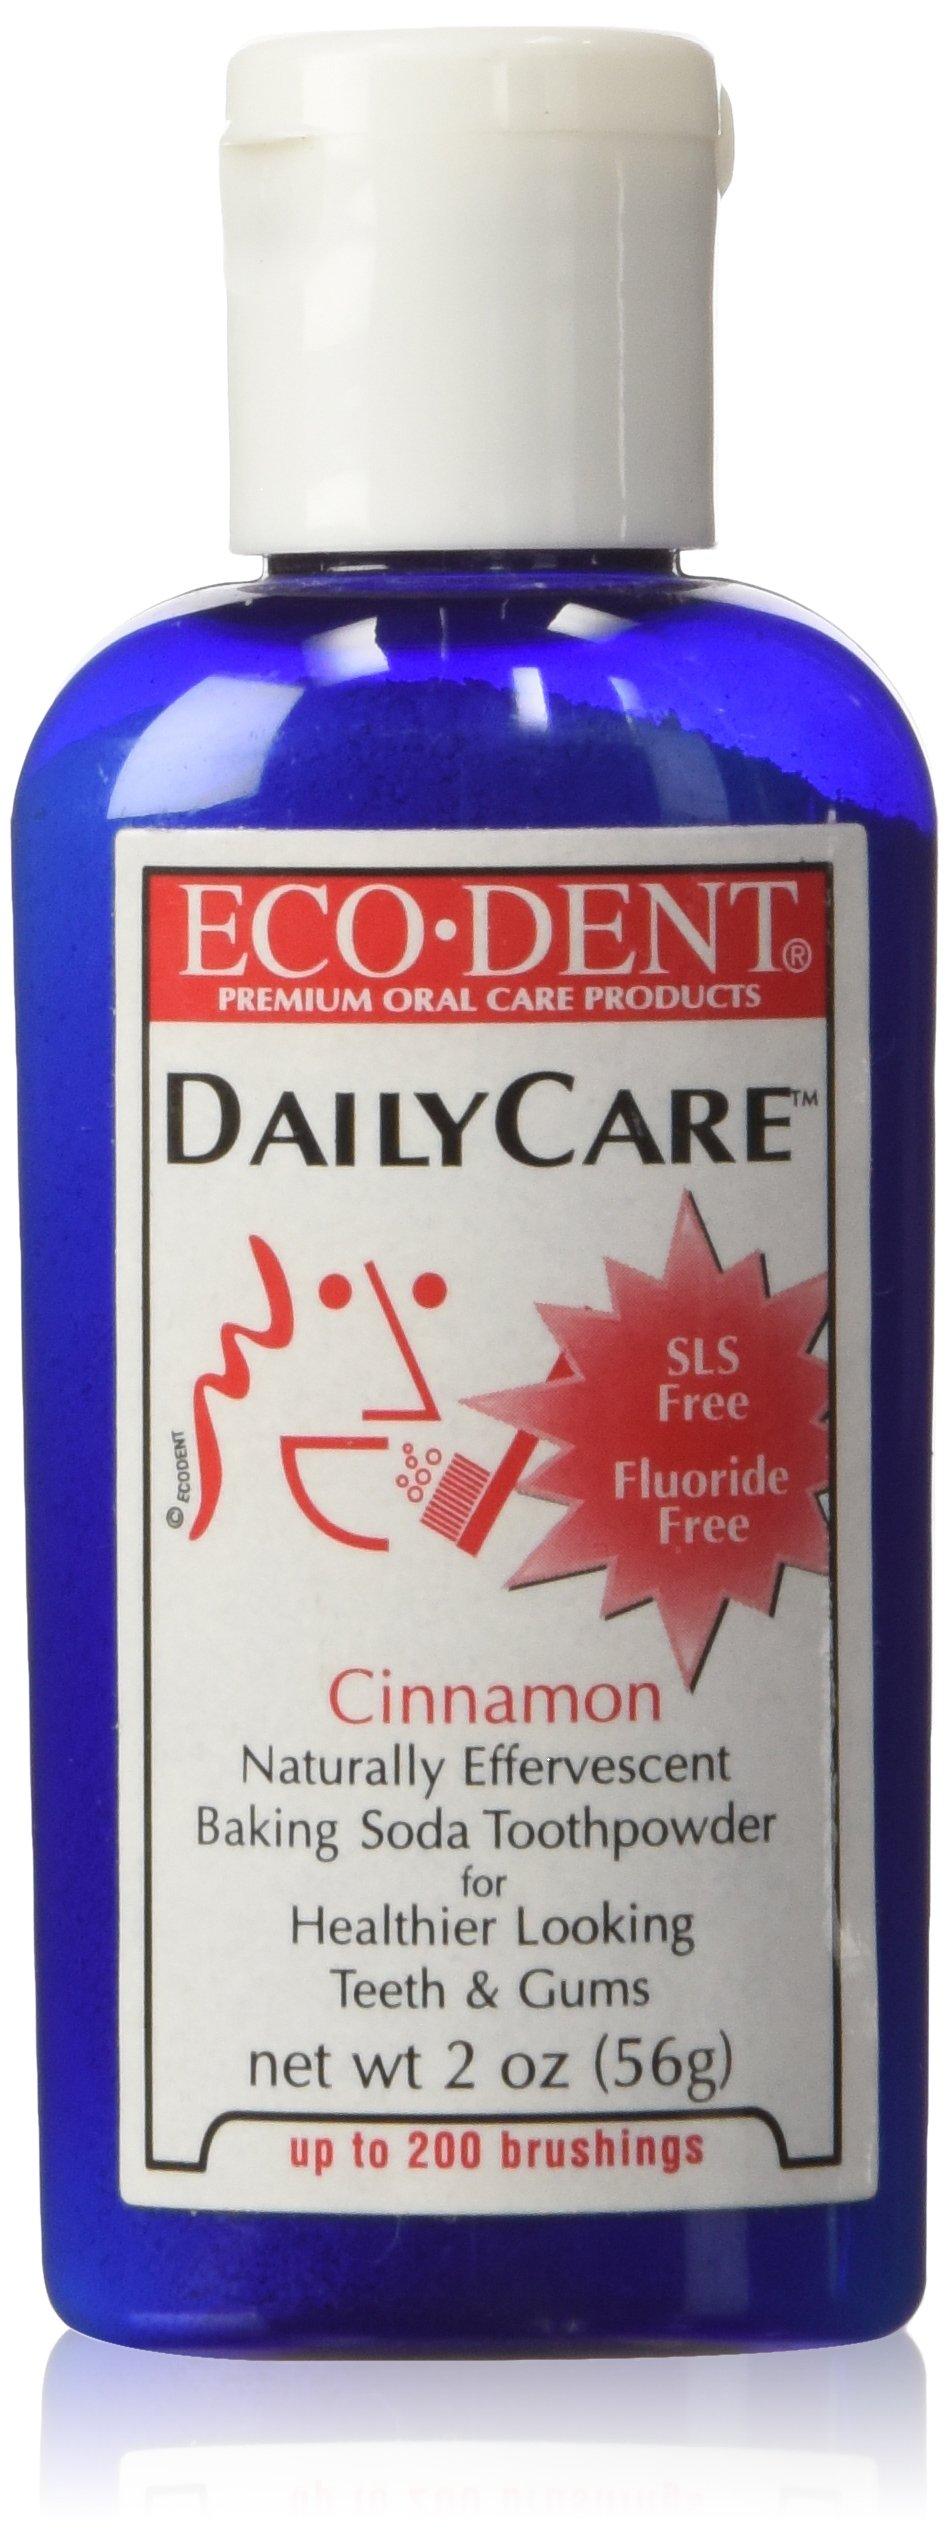 Eco-Dent Baking Soda Toothpowder...Cinnamon, 2oz